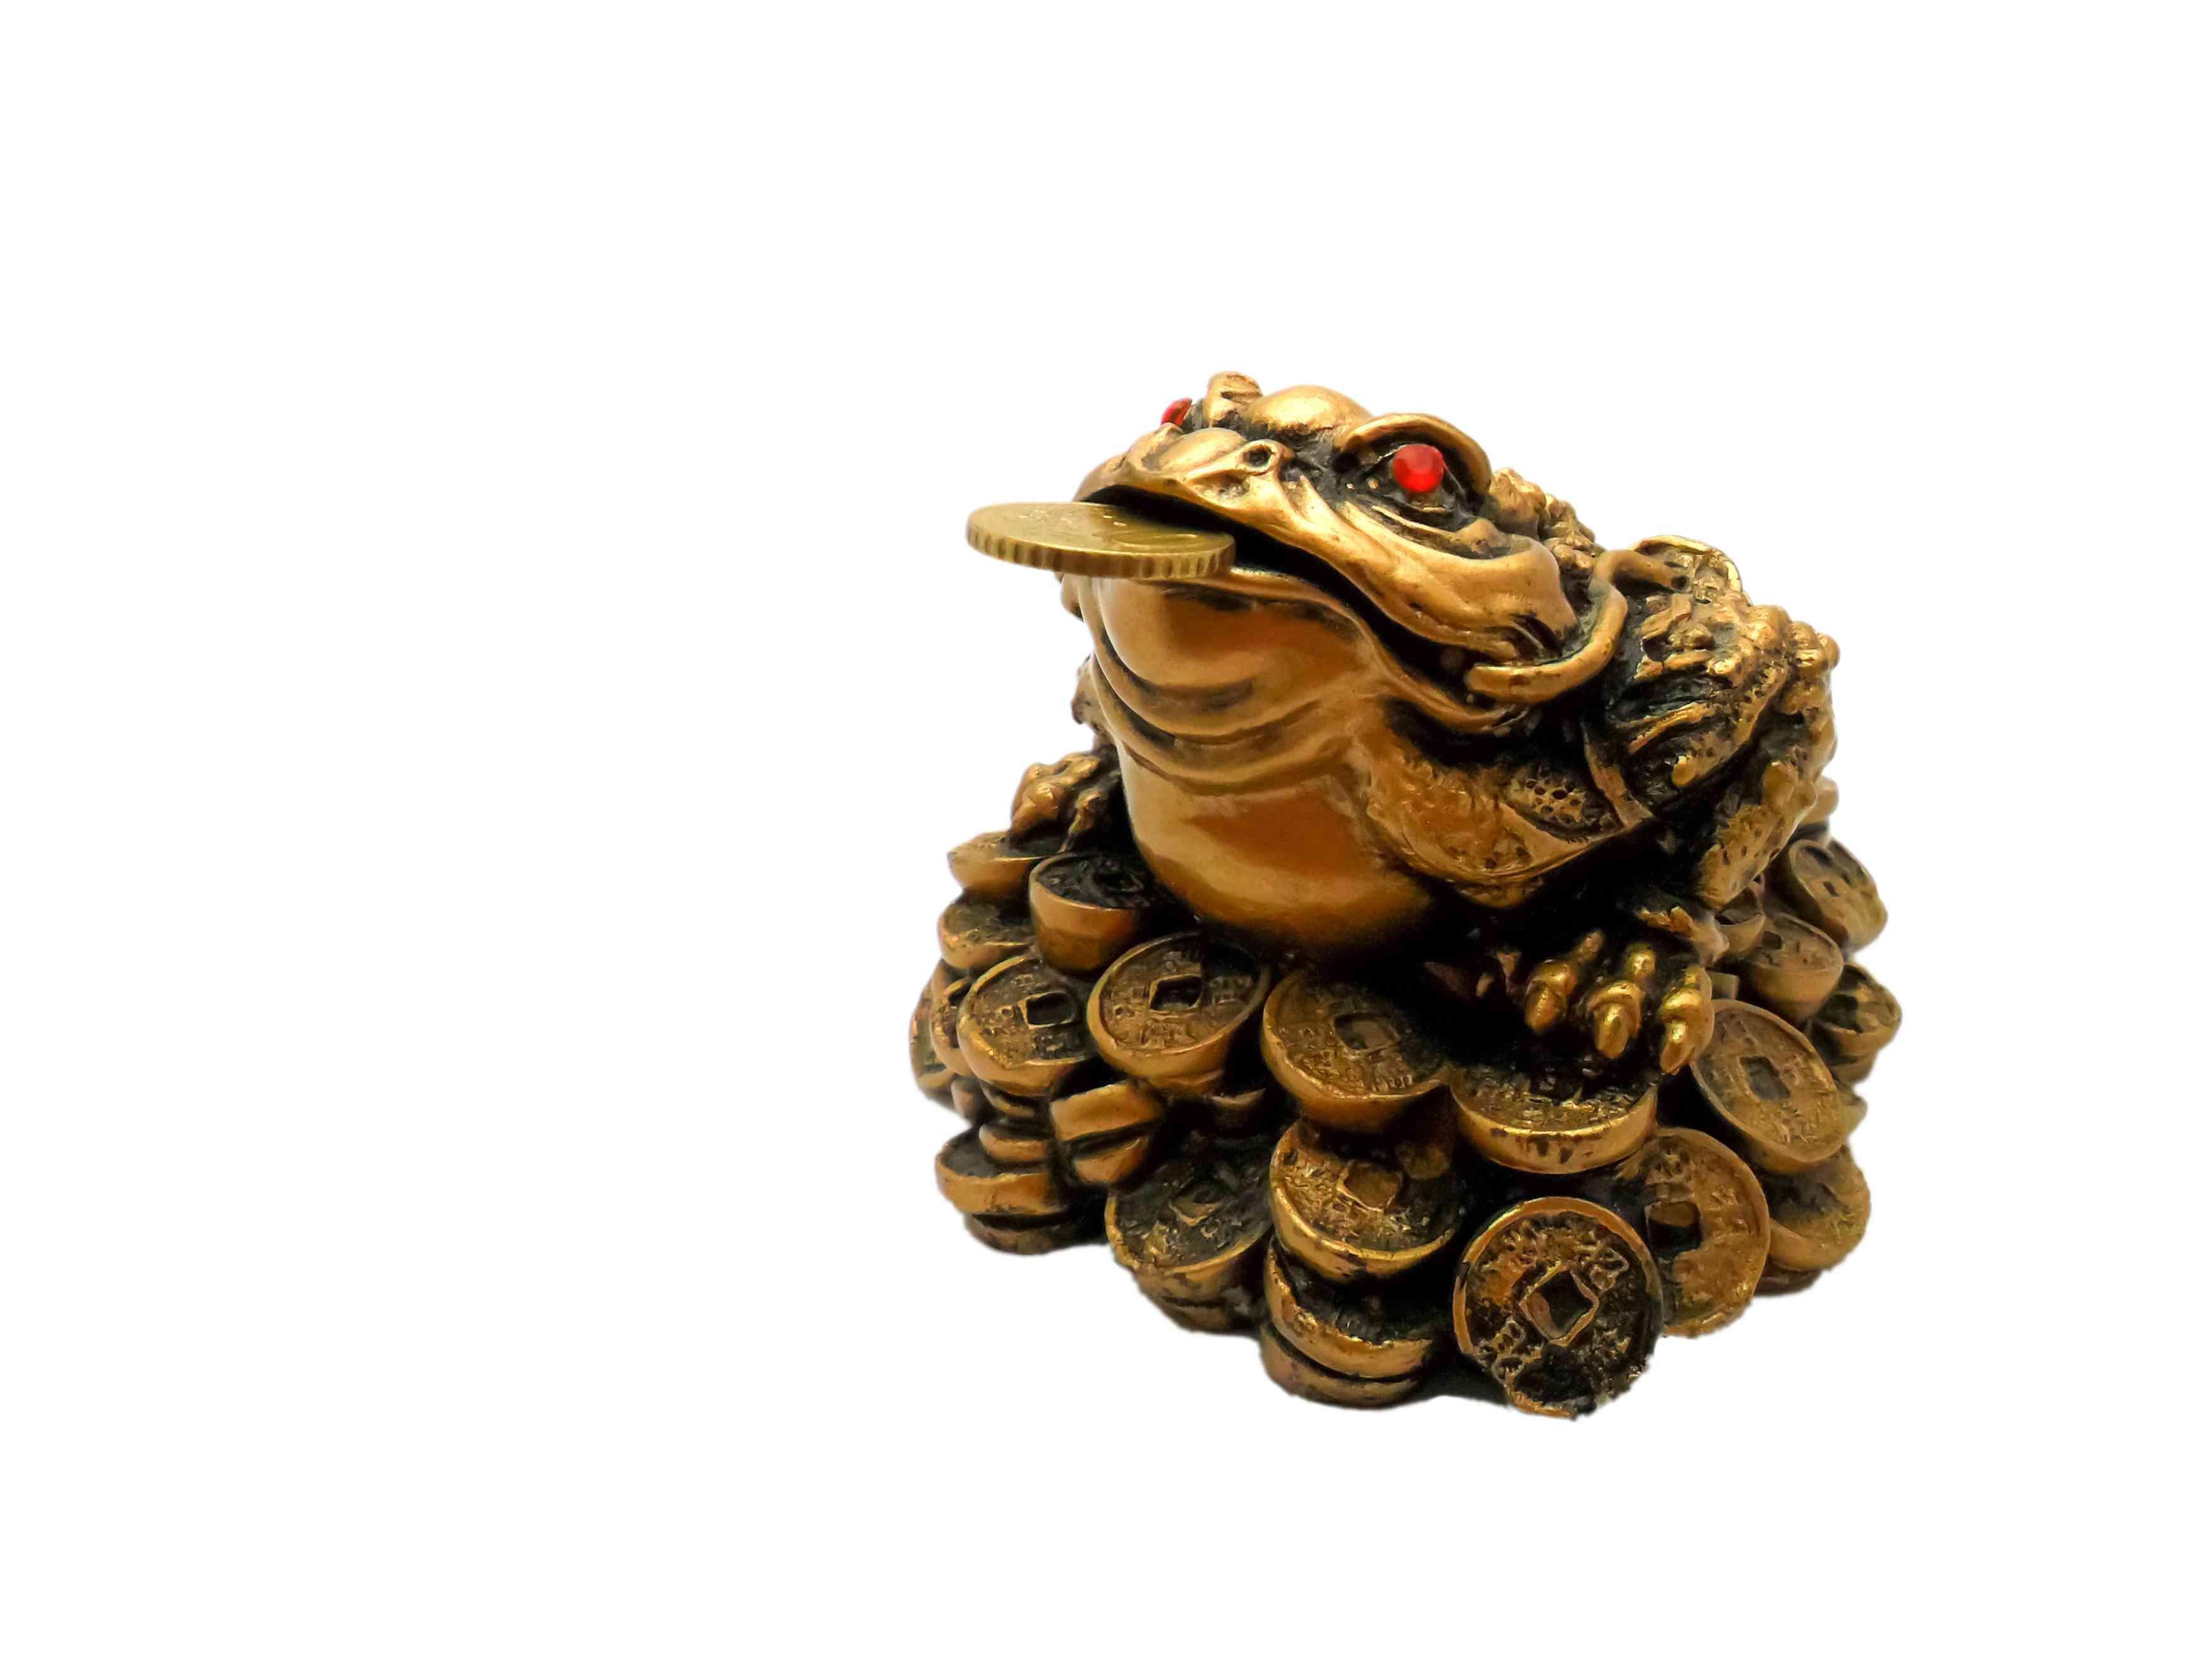 Three-legged toad, money frog, symbol of wealth on white background, isolated